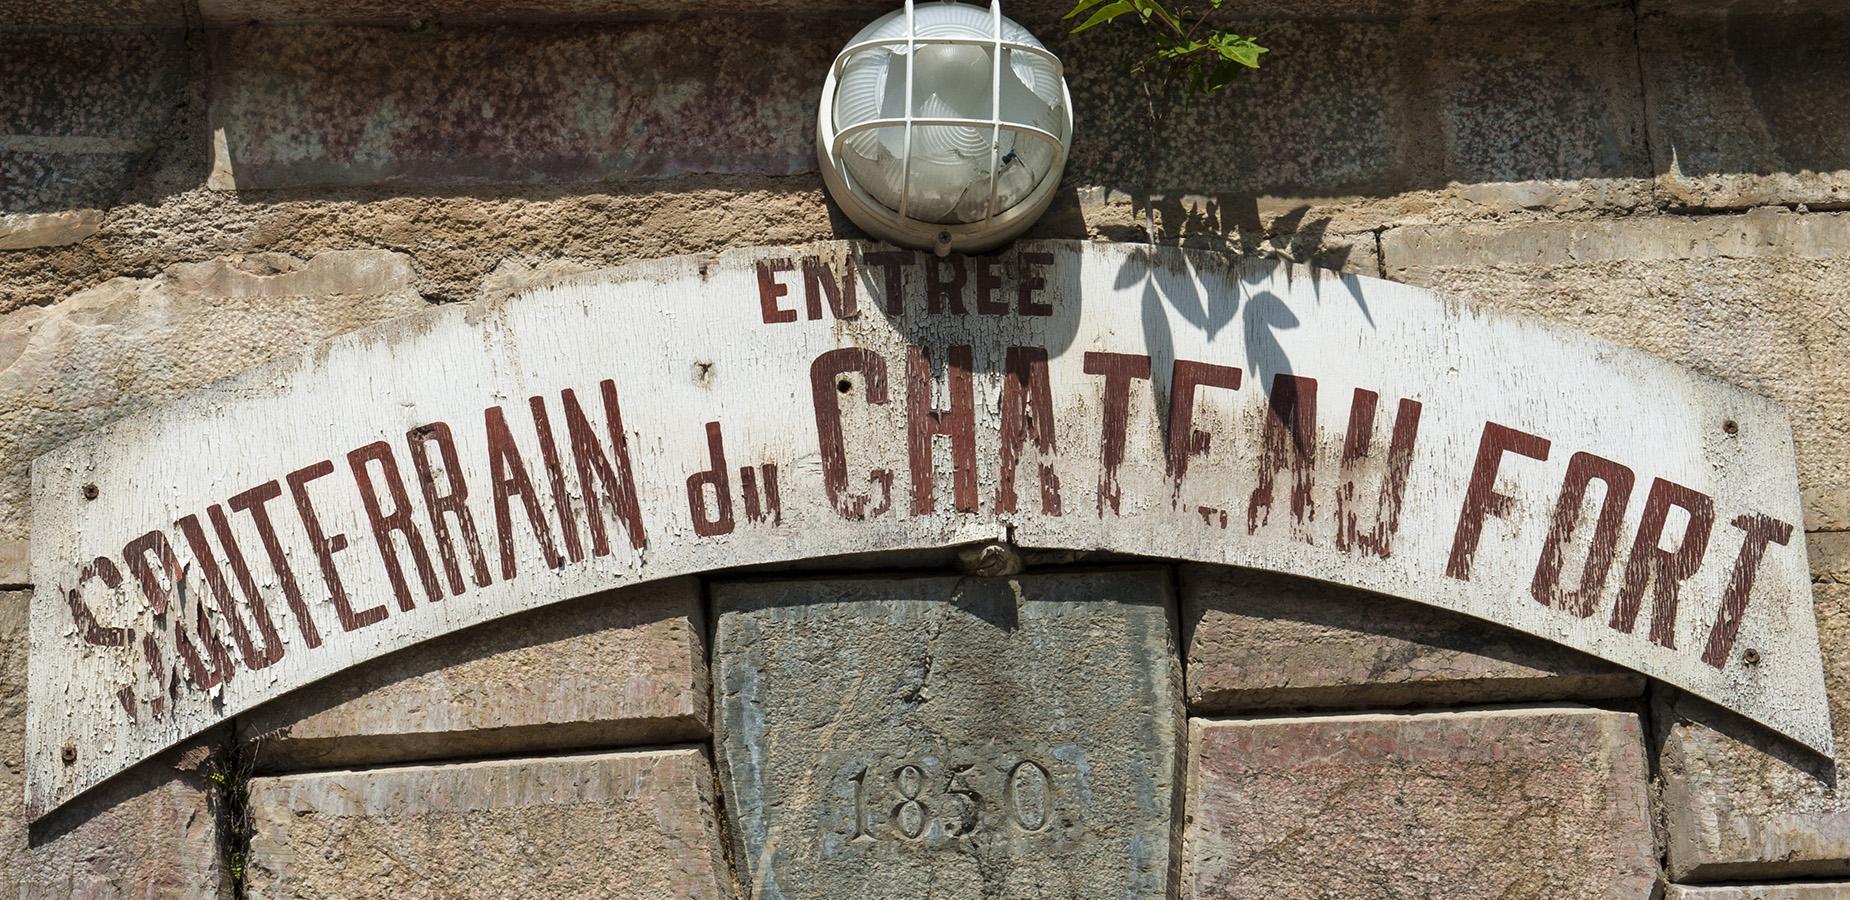 Villefranche-de-Conflent: unterirdischer Gang zum Château Fort. Foto: Hilke Maunder